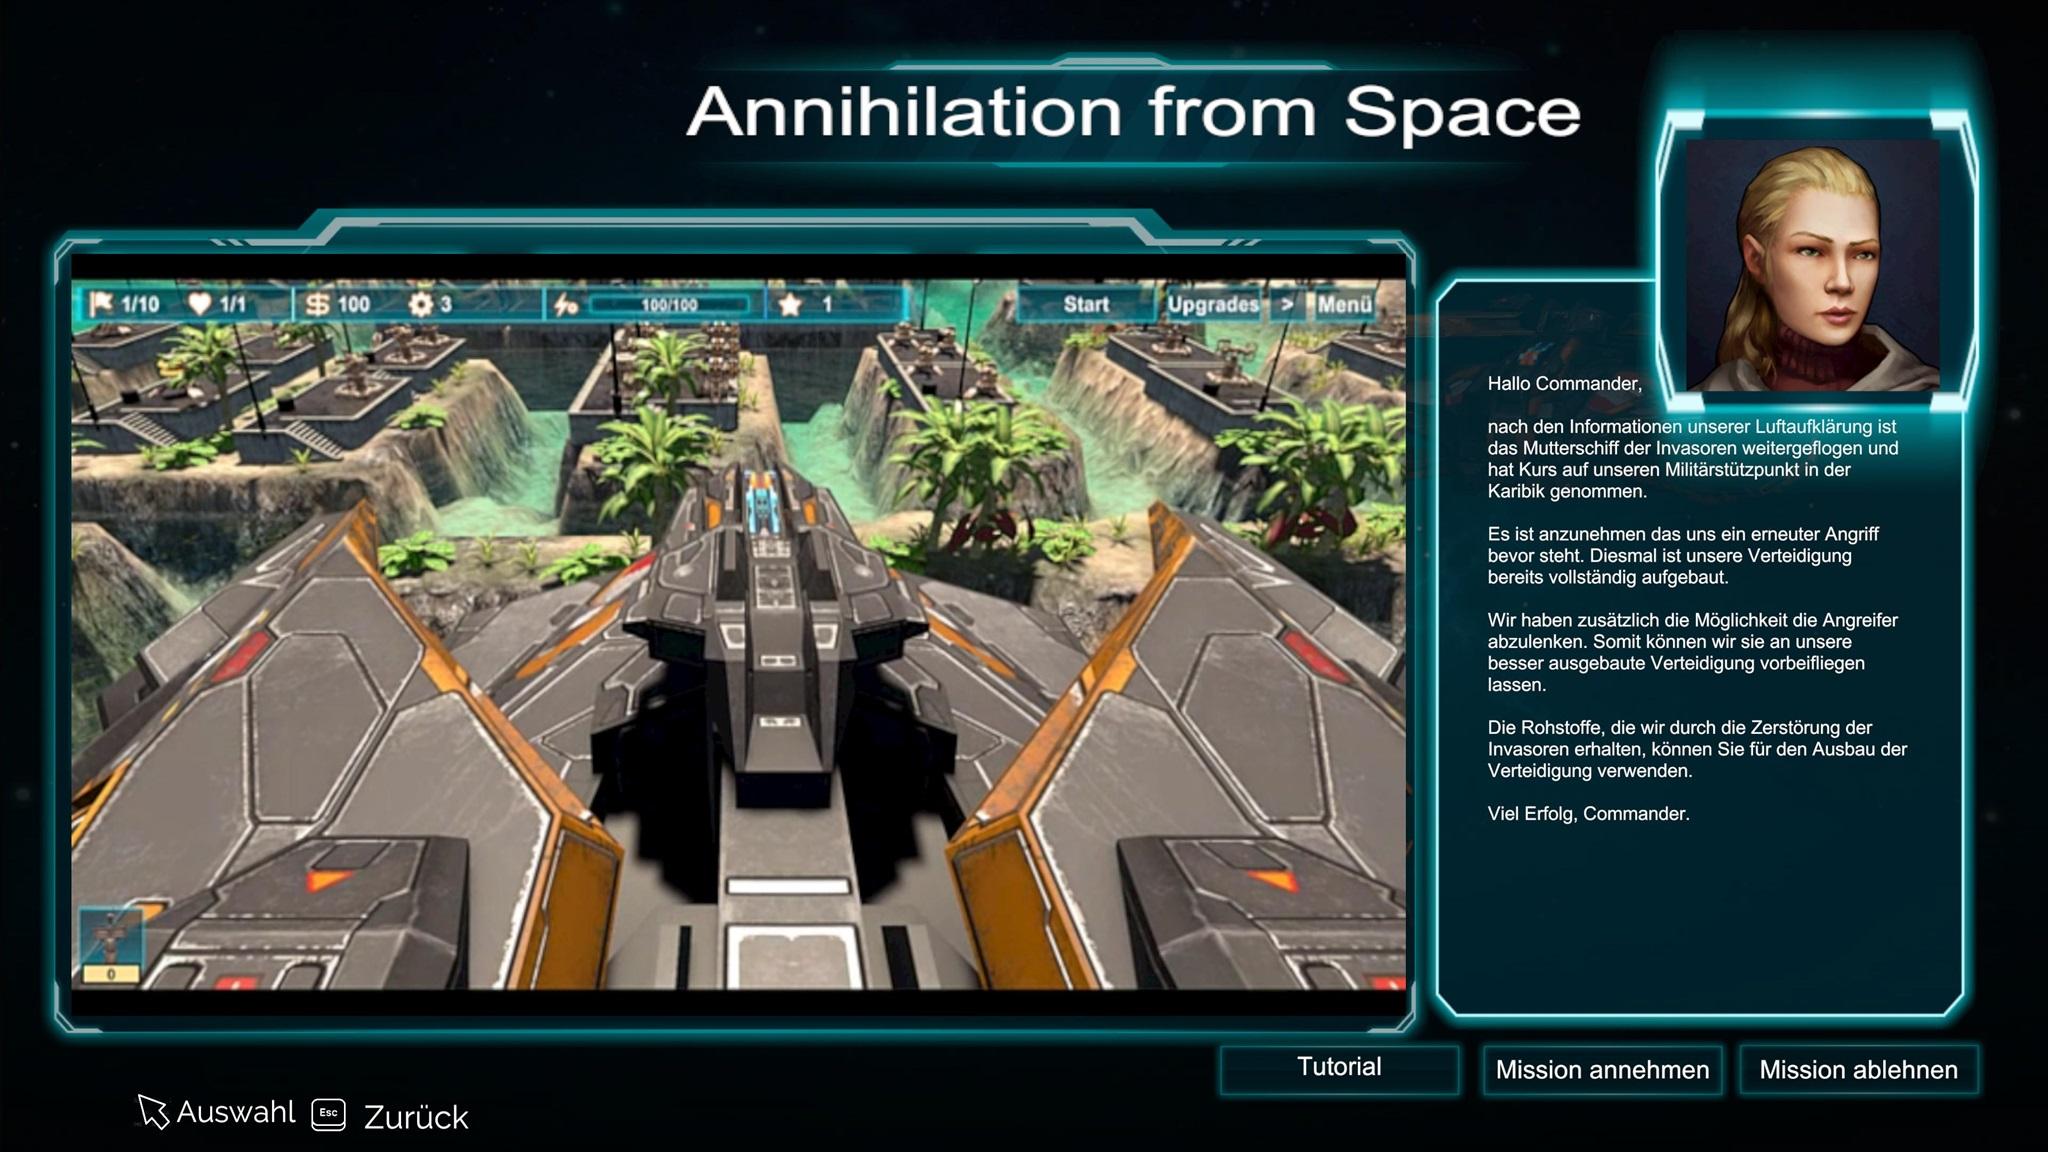 tower-defense-scifi-2021-02-04-16-44-17-89-large.jpg